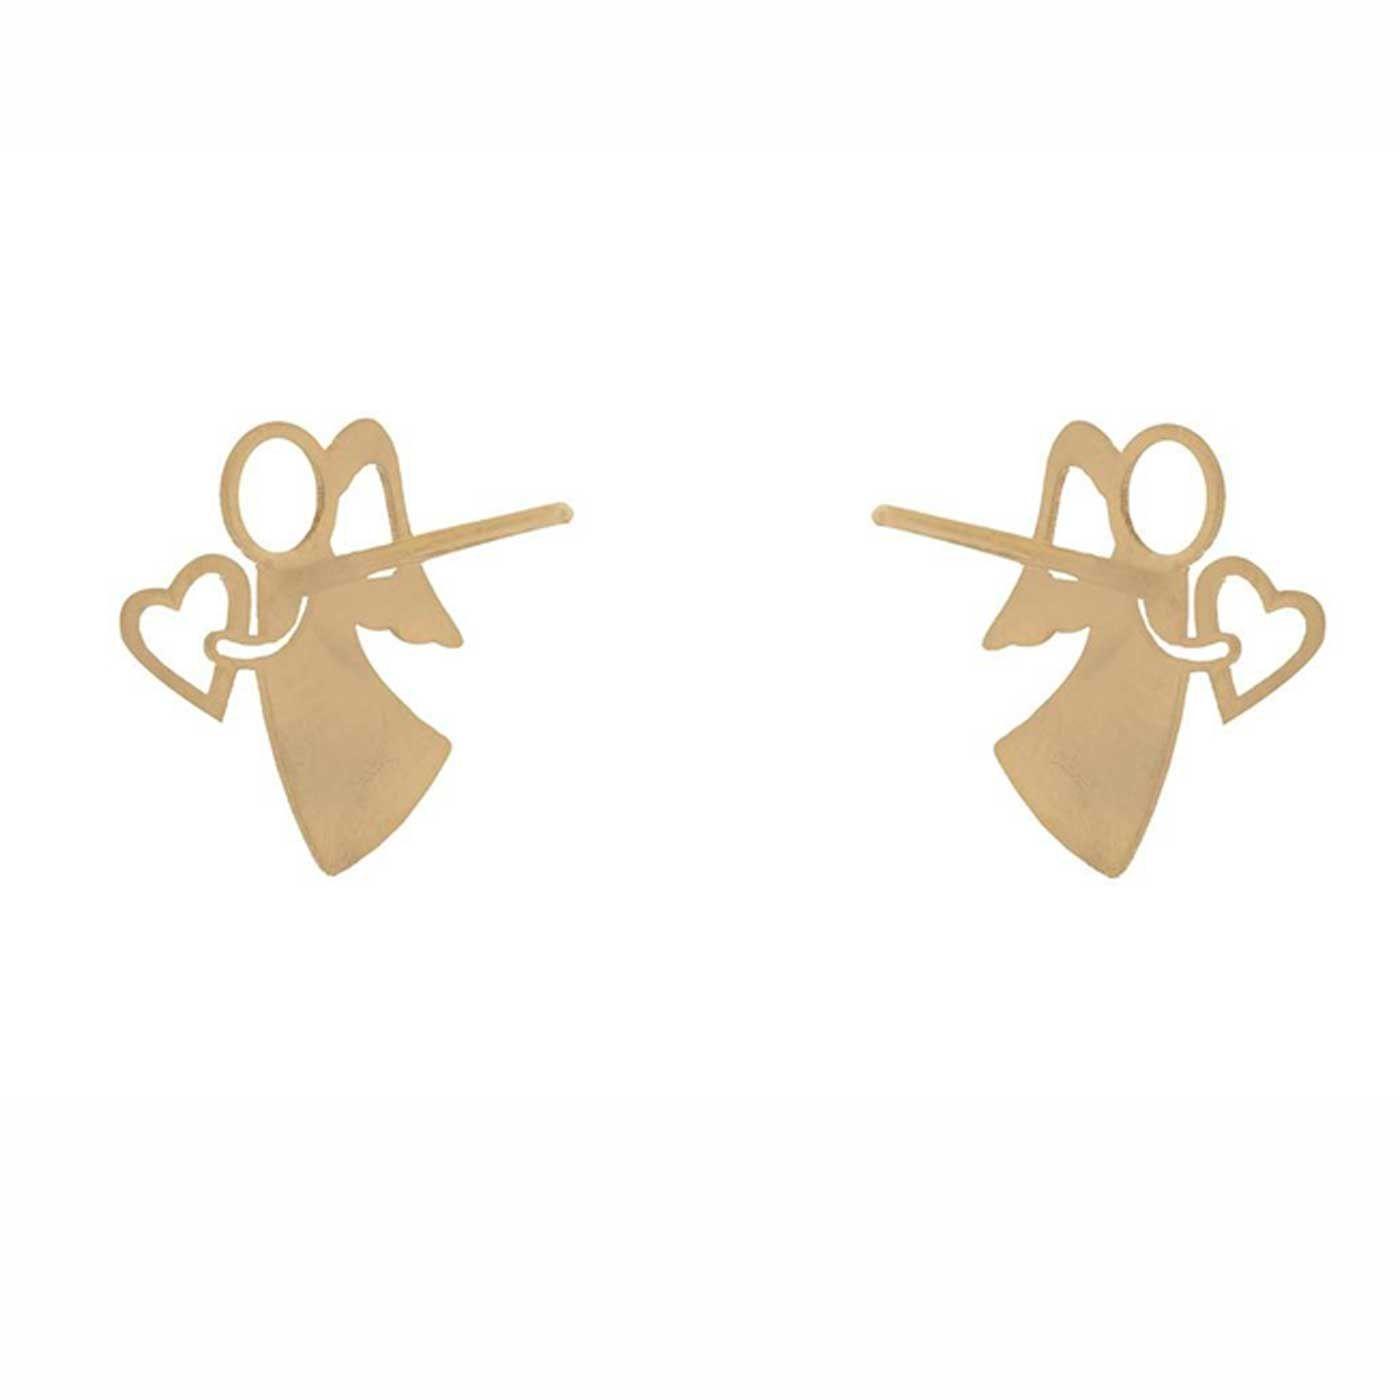 گوشواره طلا 18 عیار زنانه کانیار گالری کد GOA105 -  - 5